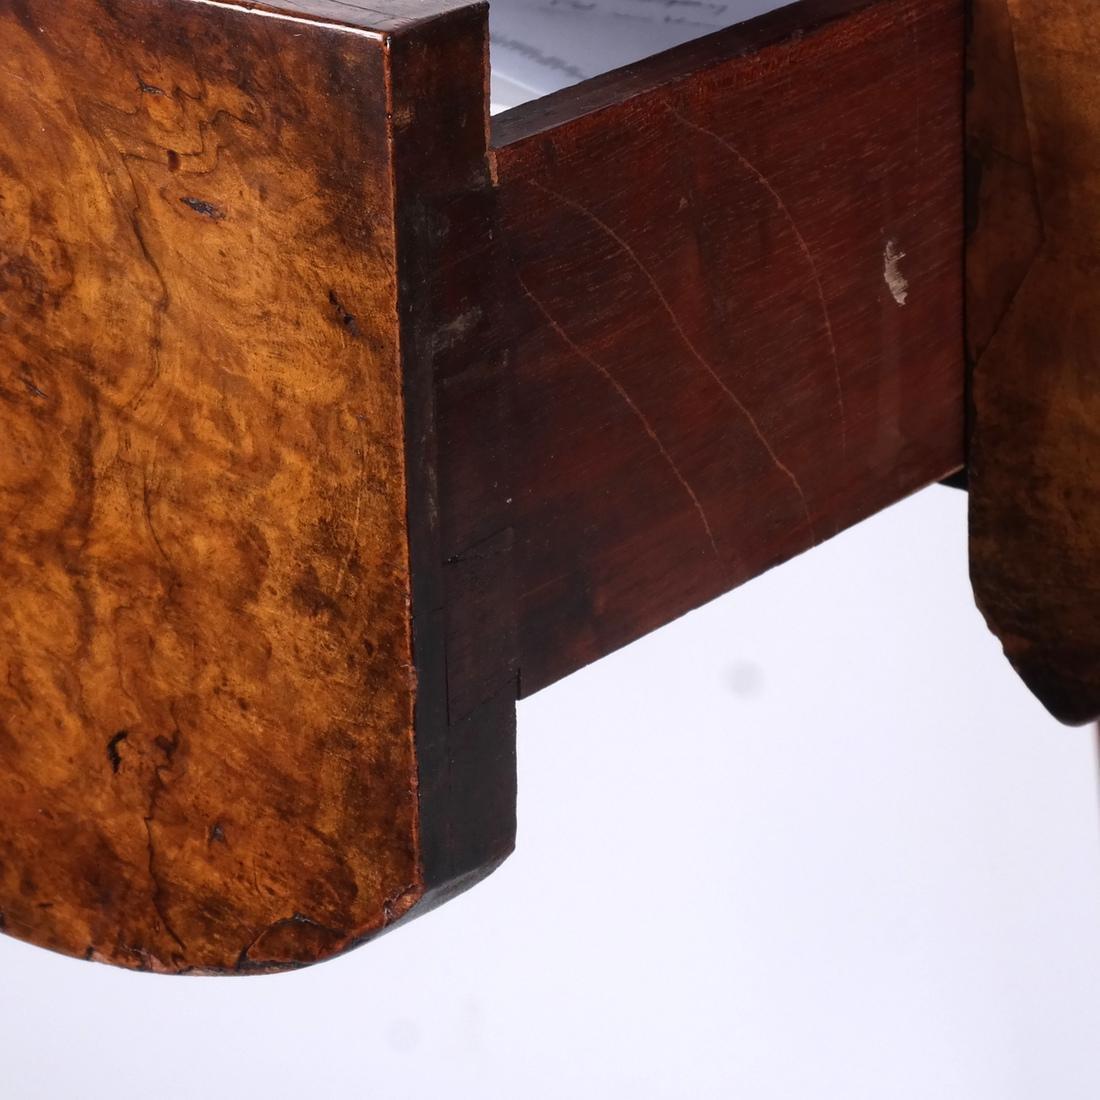 Walnut Tooled Leather Bureau Plat - 5